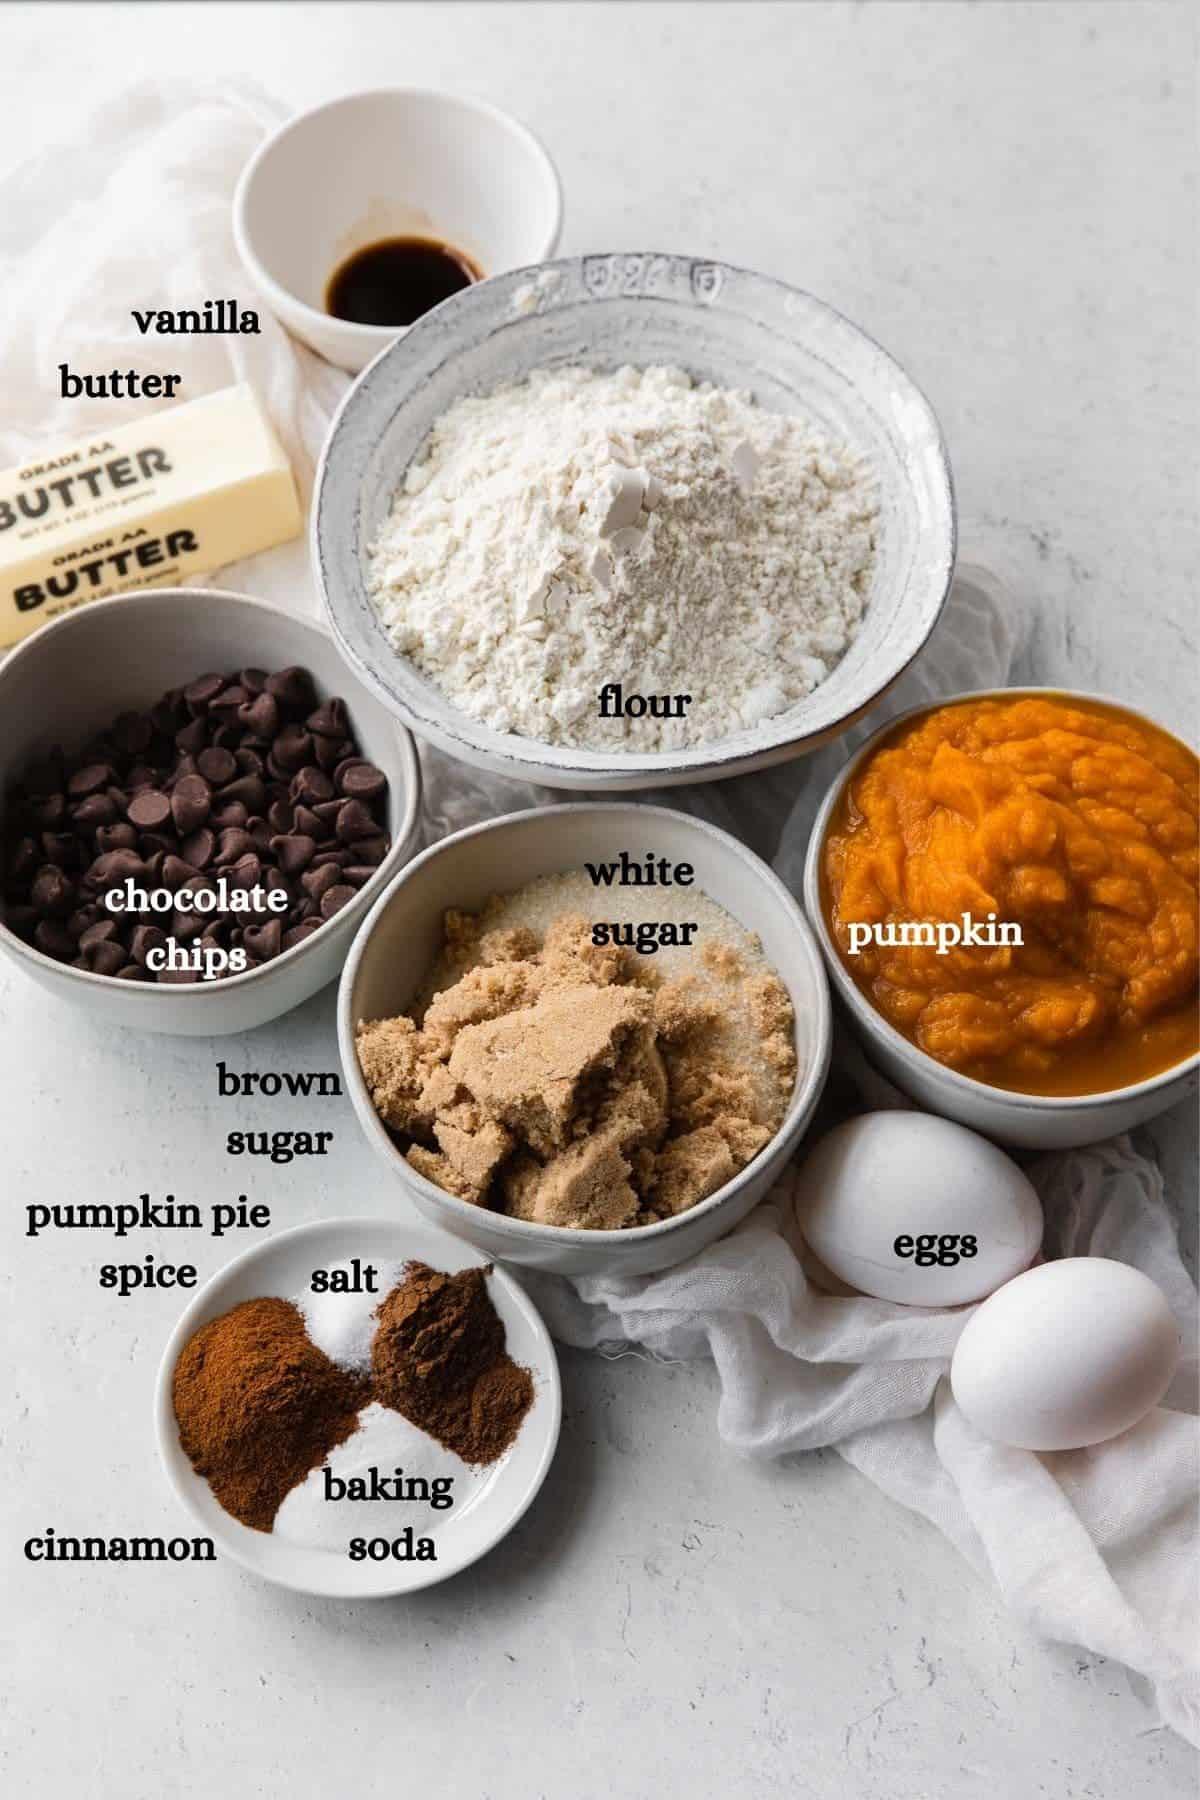 Vanilla, butter, chocolate chips, flour, white sugar, brown sugar, pumpkin, pumpkin pie spice, salt, cinnamon, baking soda, eggs.